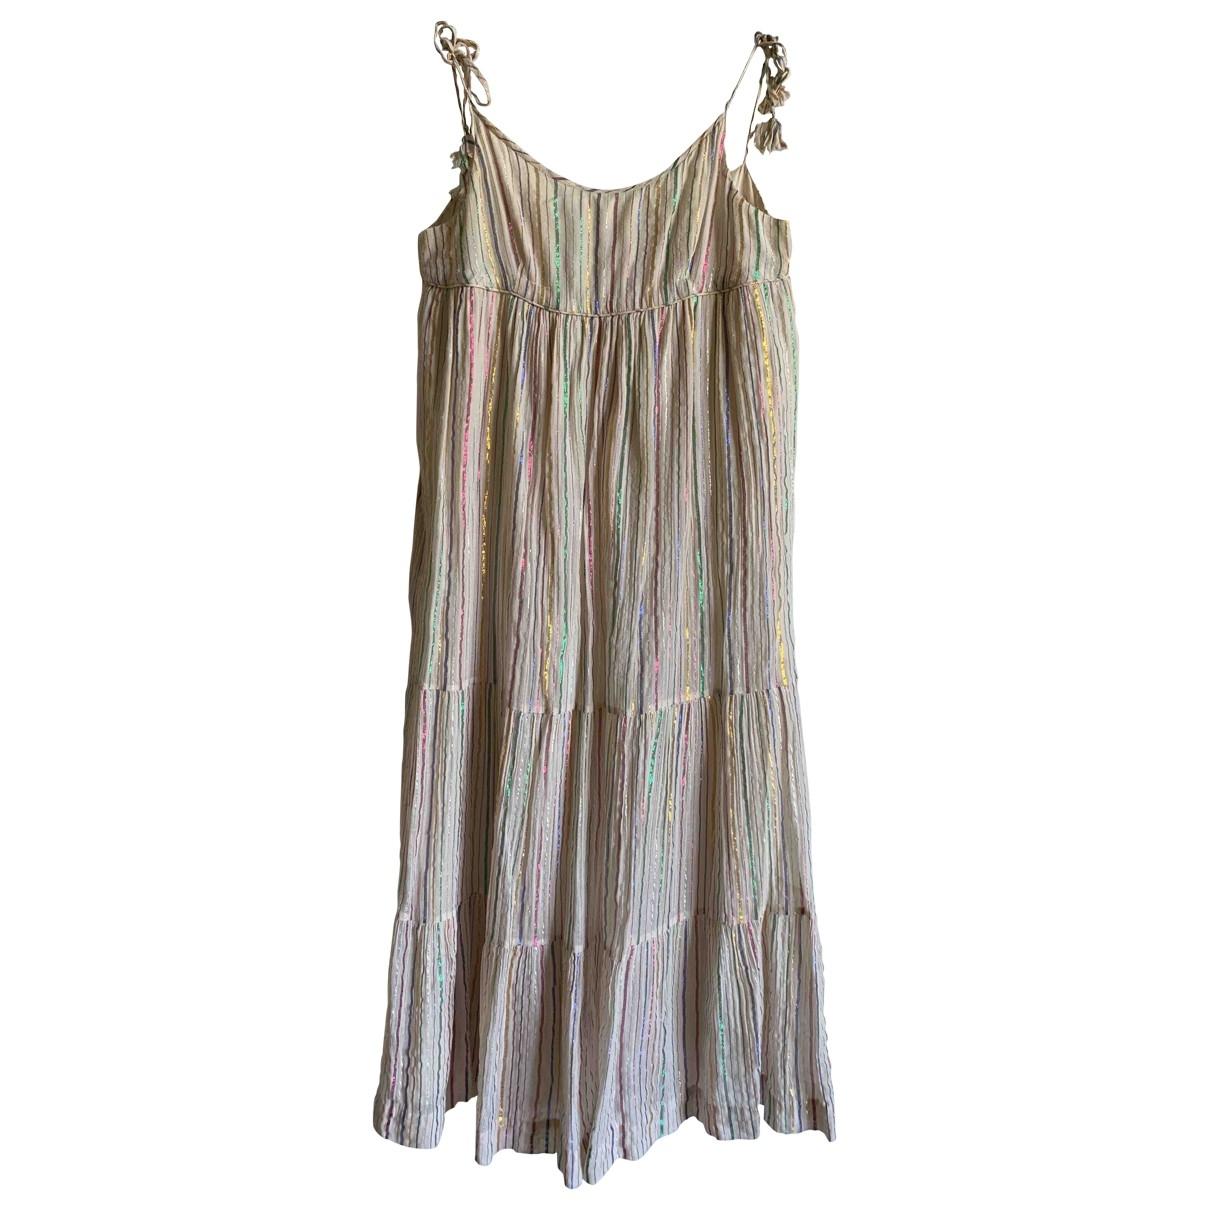 Bonpoint \N Ecru Cotton dress for Women S